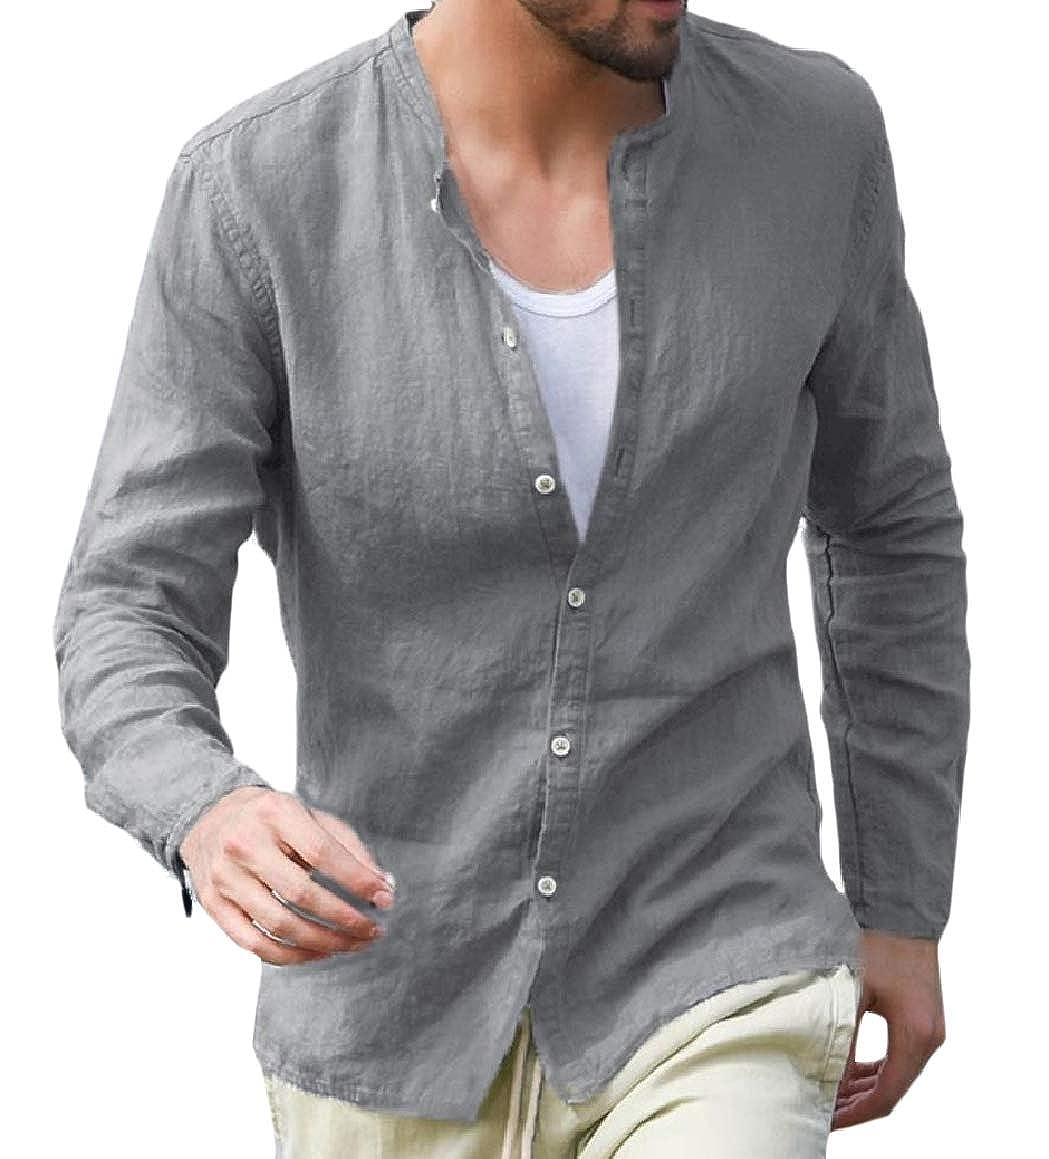 Abetteric Mens Tunic Shirt Linen Buttoned Stand Up Collar Comfort Blouse Tops